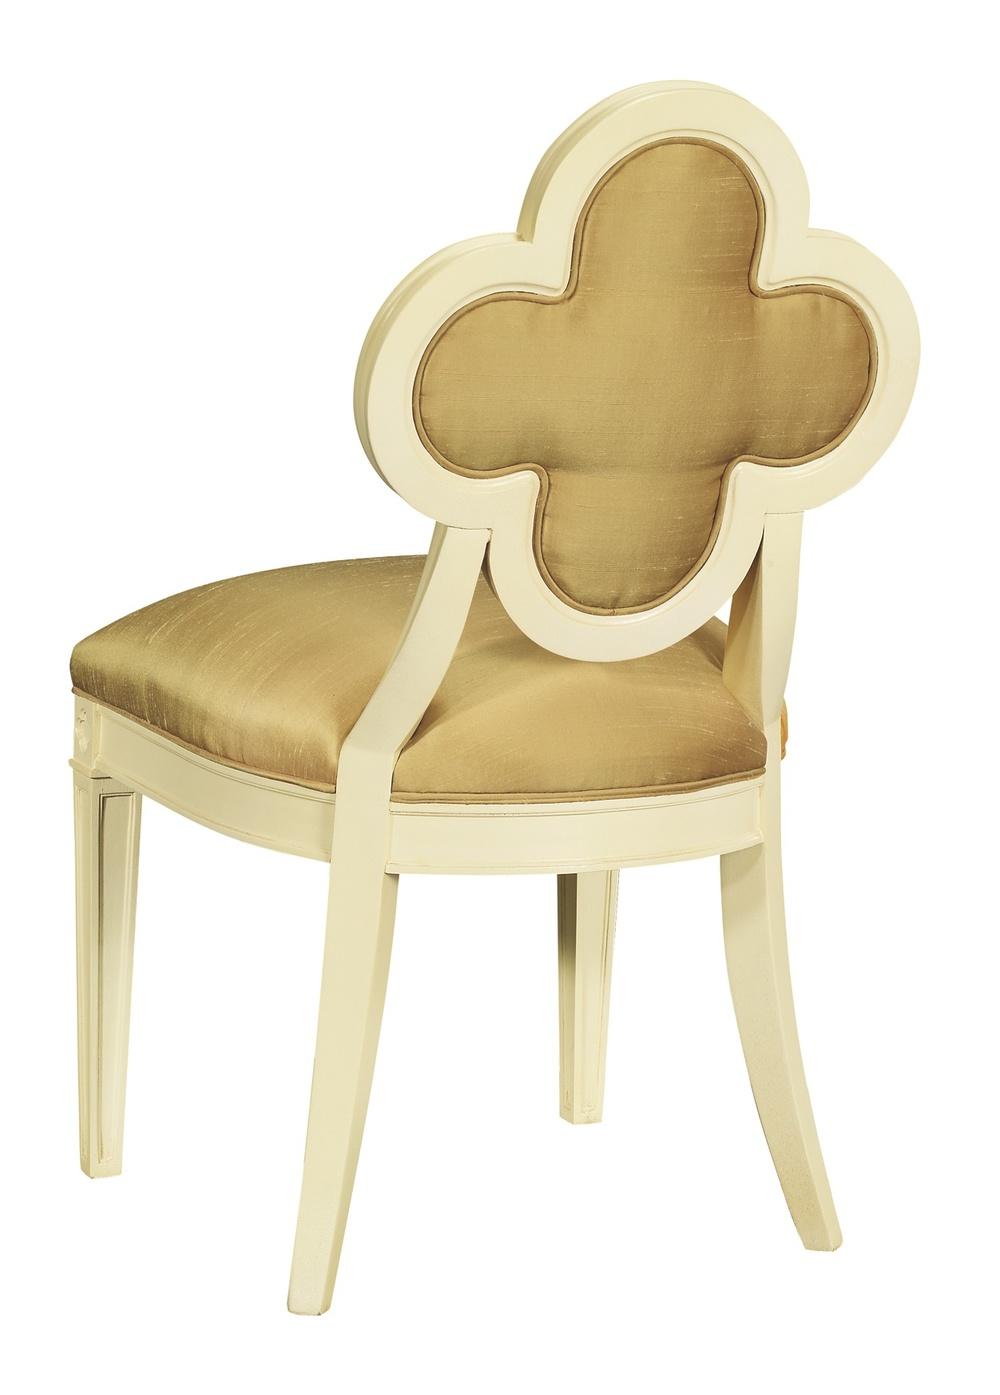 Hickory Chair - Alexandra Chair